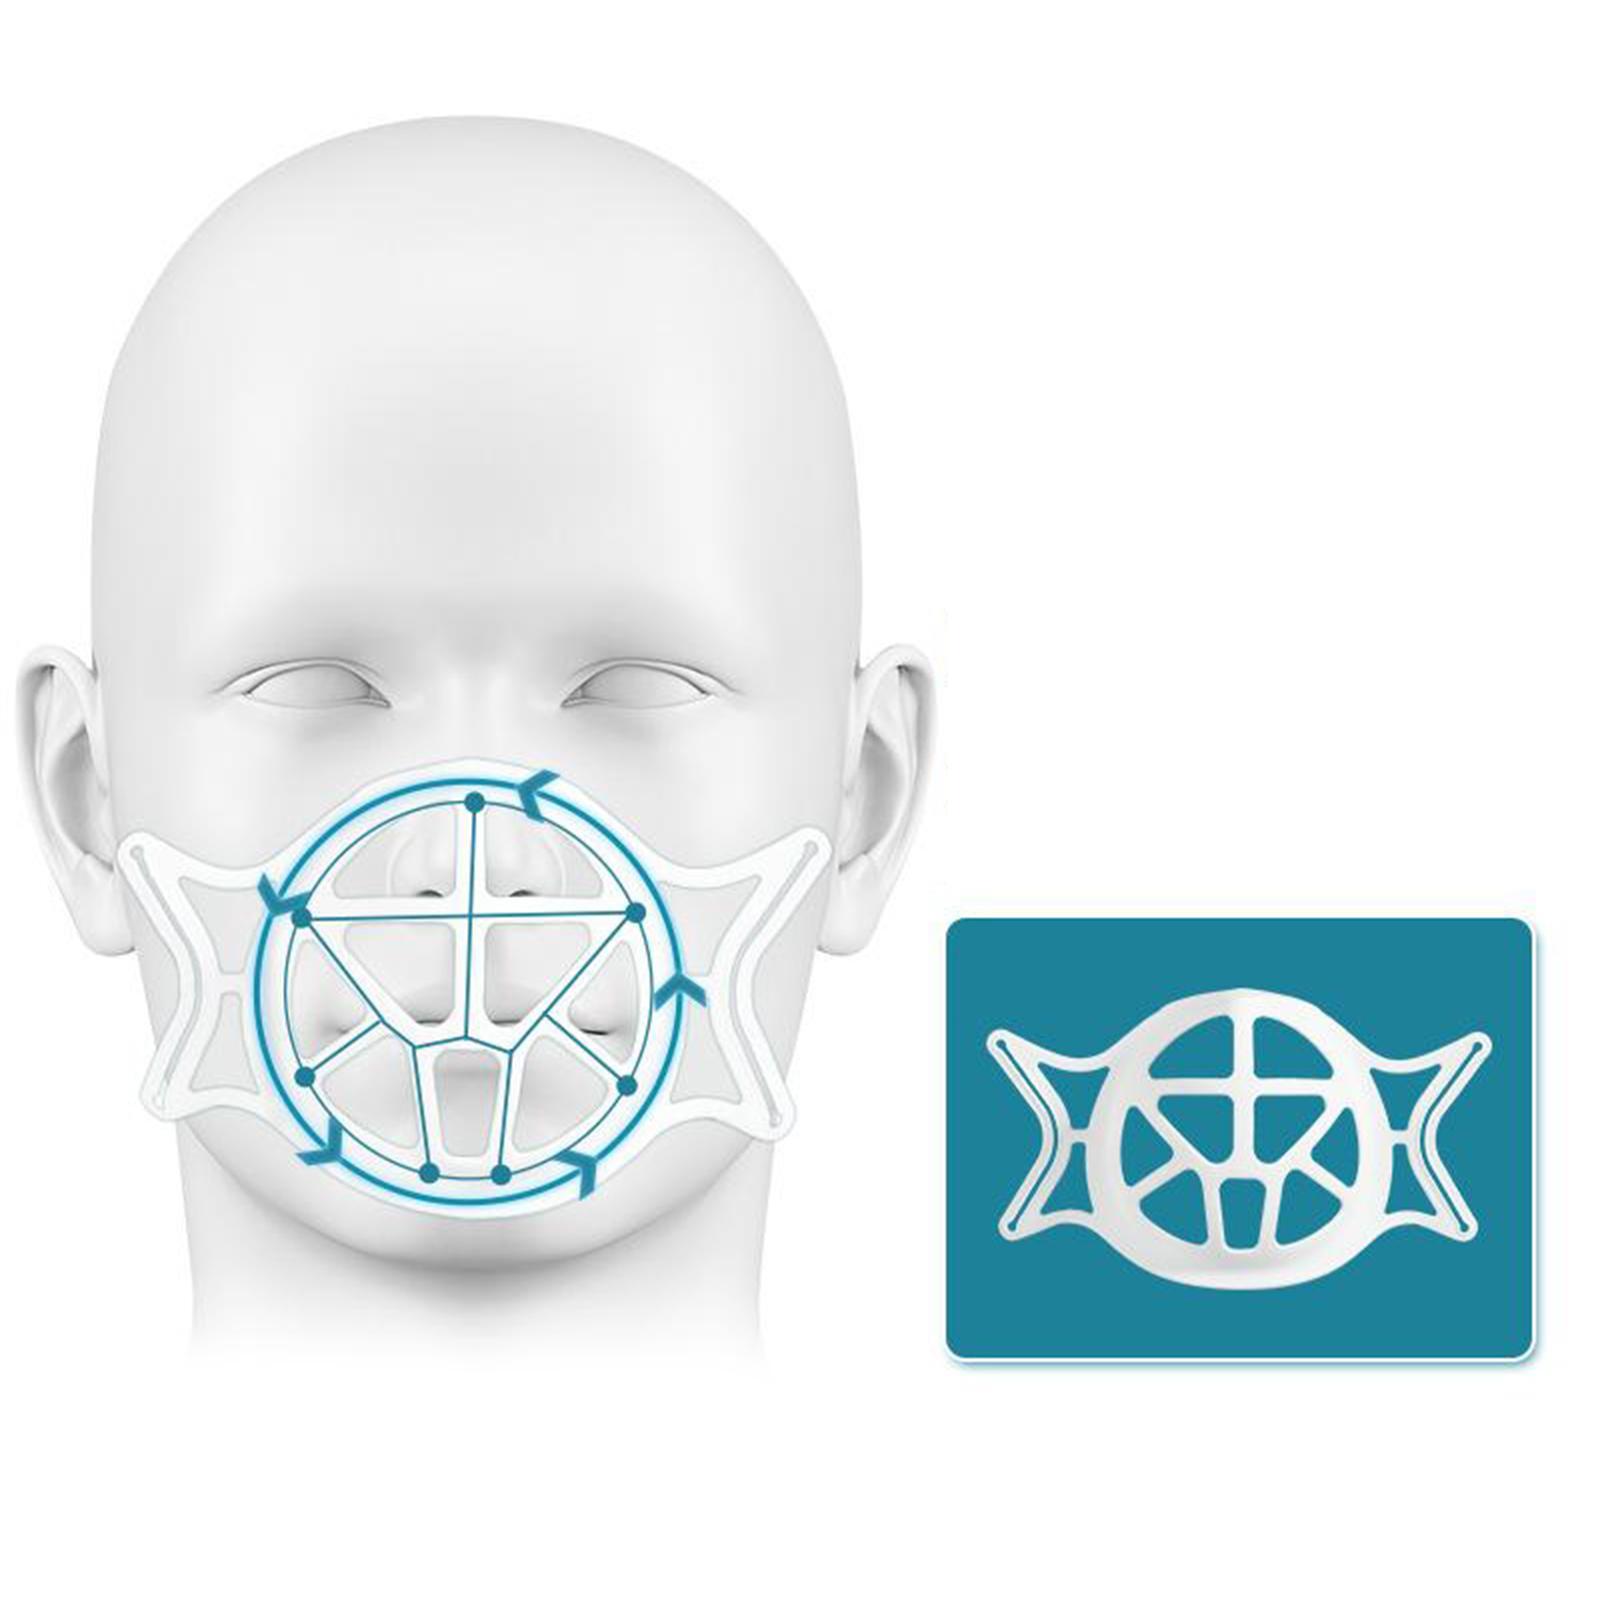 3D Face Mask Bracket Washable Support Holder Lipstick Protection Stand Rack